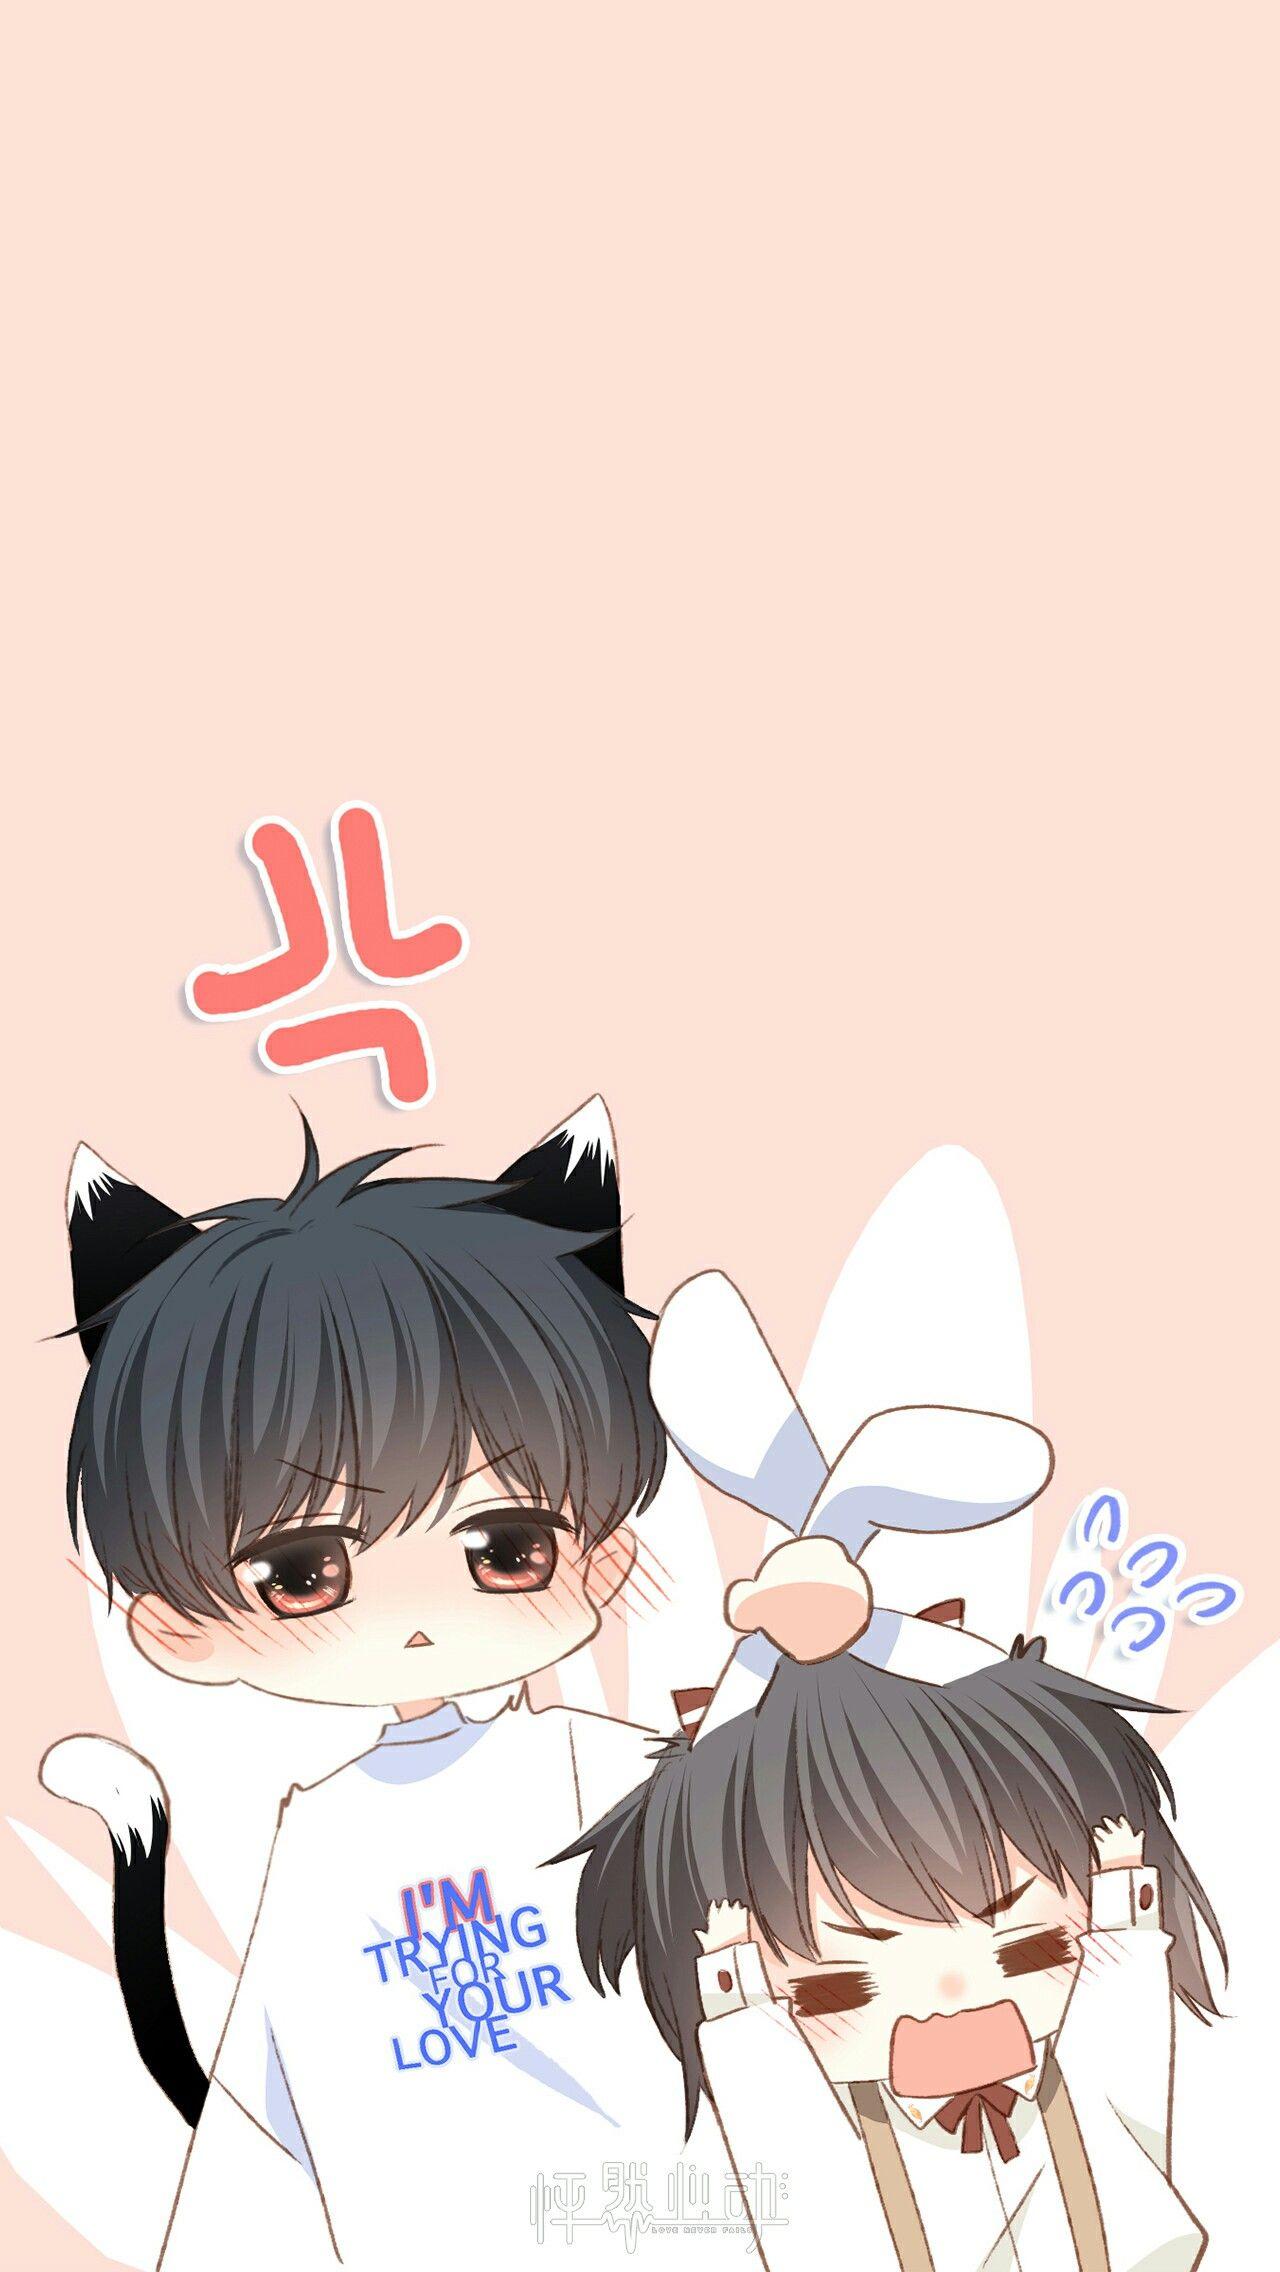 Https M Weibo Cn 1822965637 4275922918524600 Anime Anak Laki Laki Gambar Lucu Manga Anime